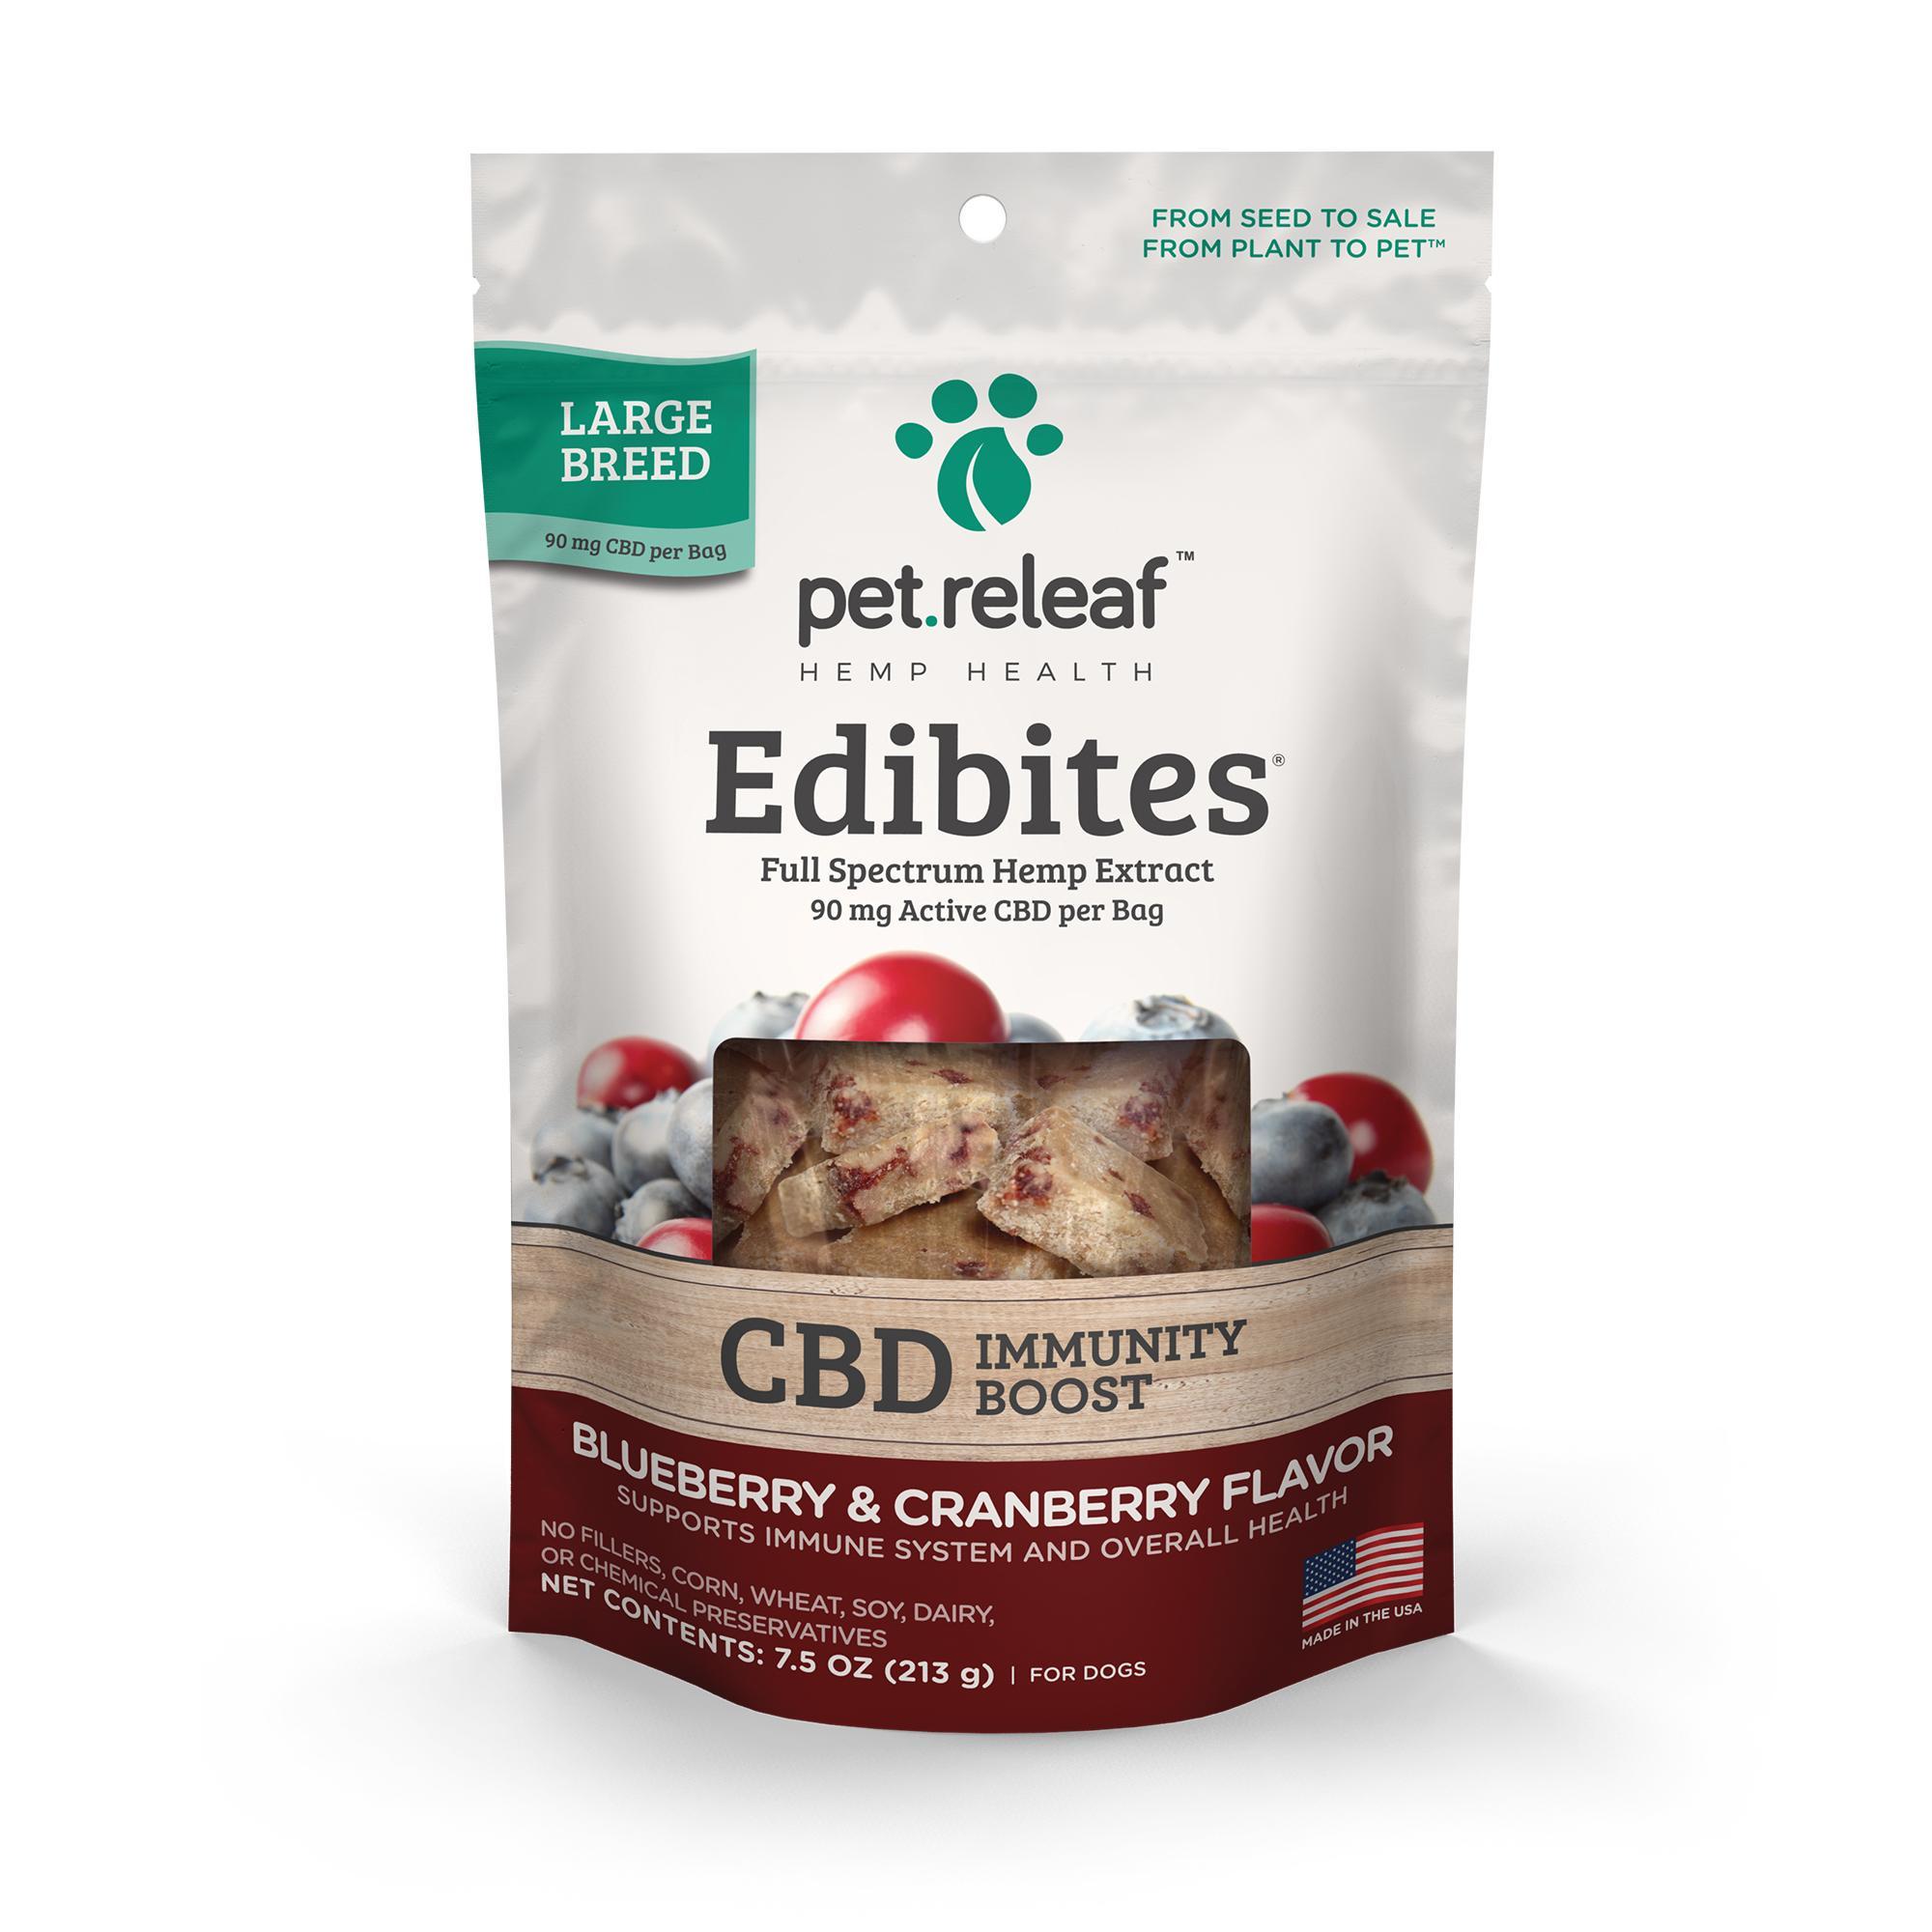 Pet Releaf Edibites Immunity Boost Blueberry & Cranberry Large Breed Dog Supplement, 7.5-oz